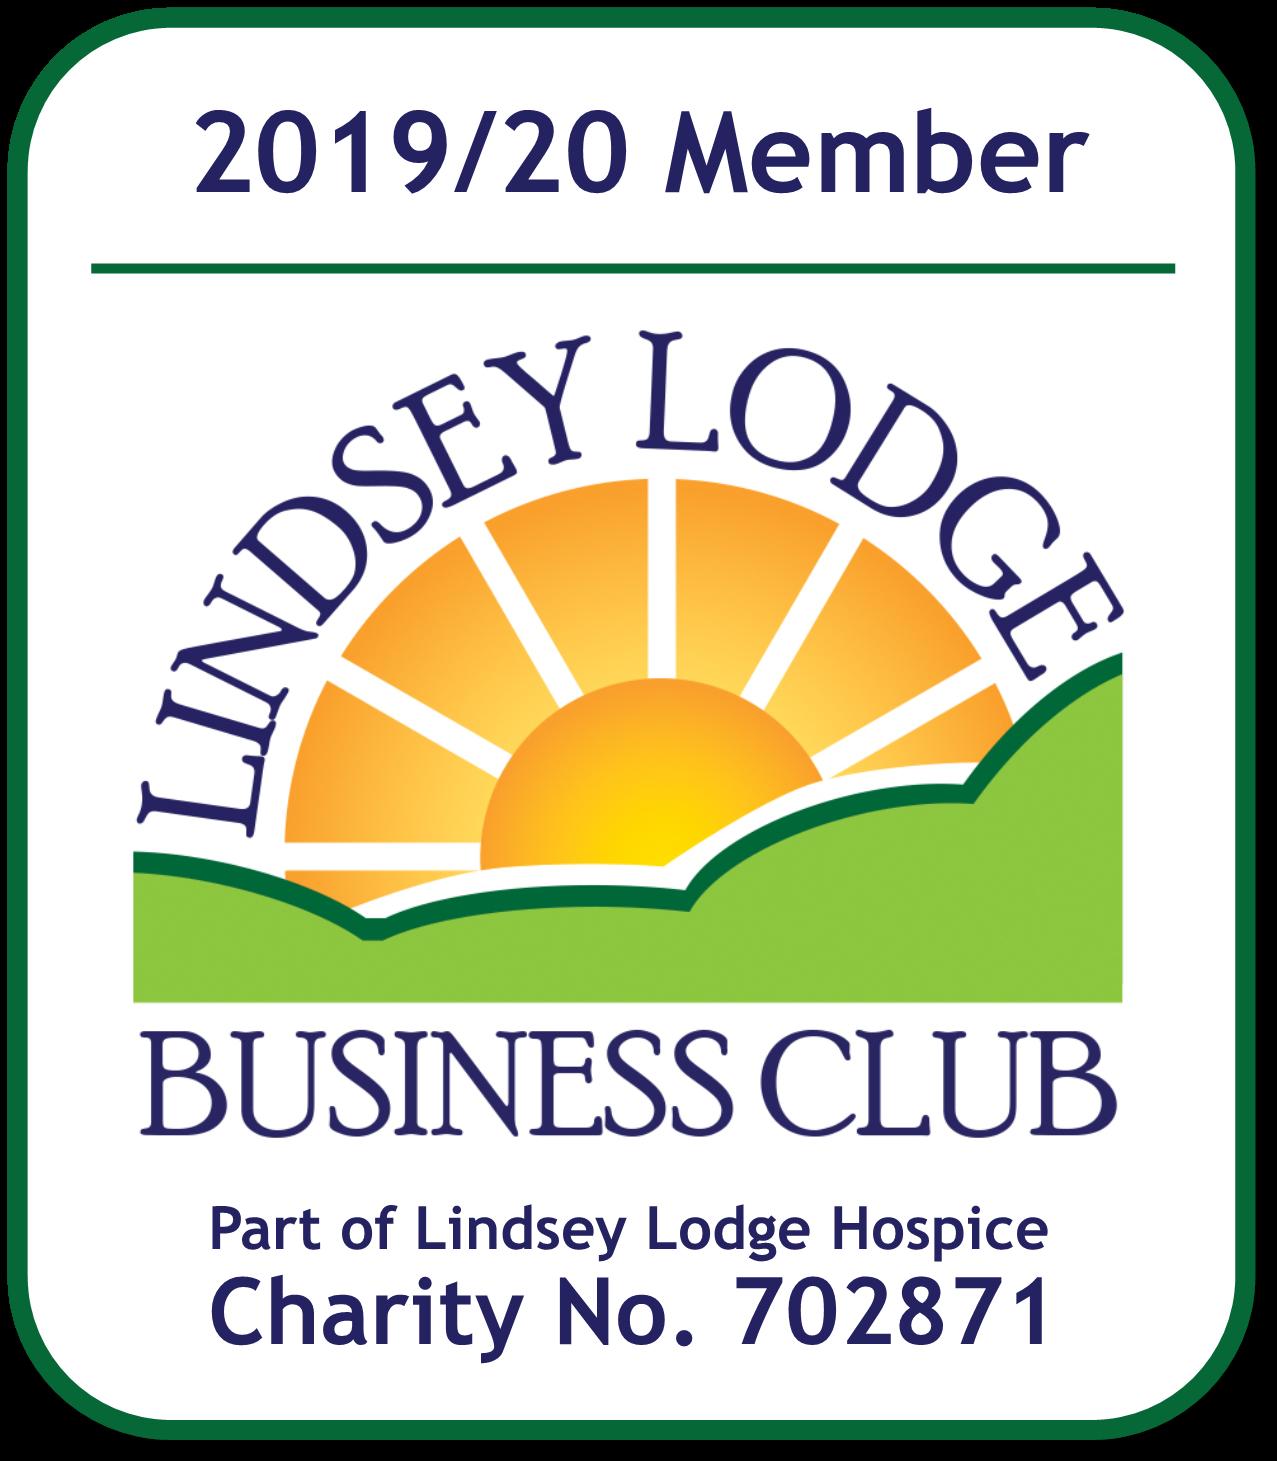 Business Club member logo